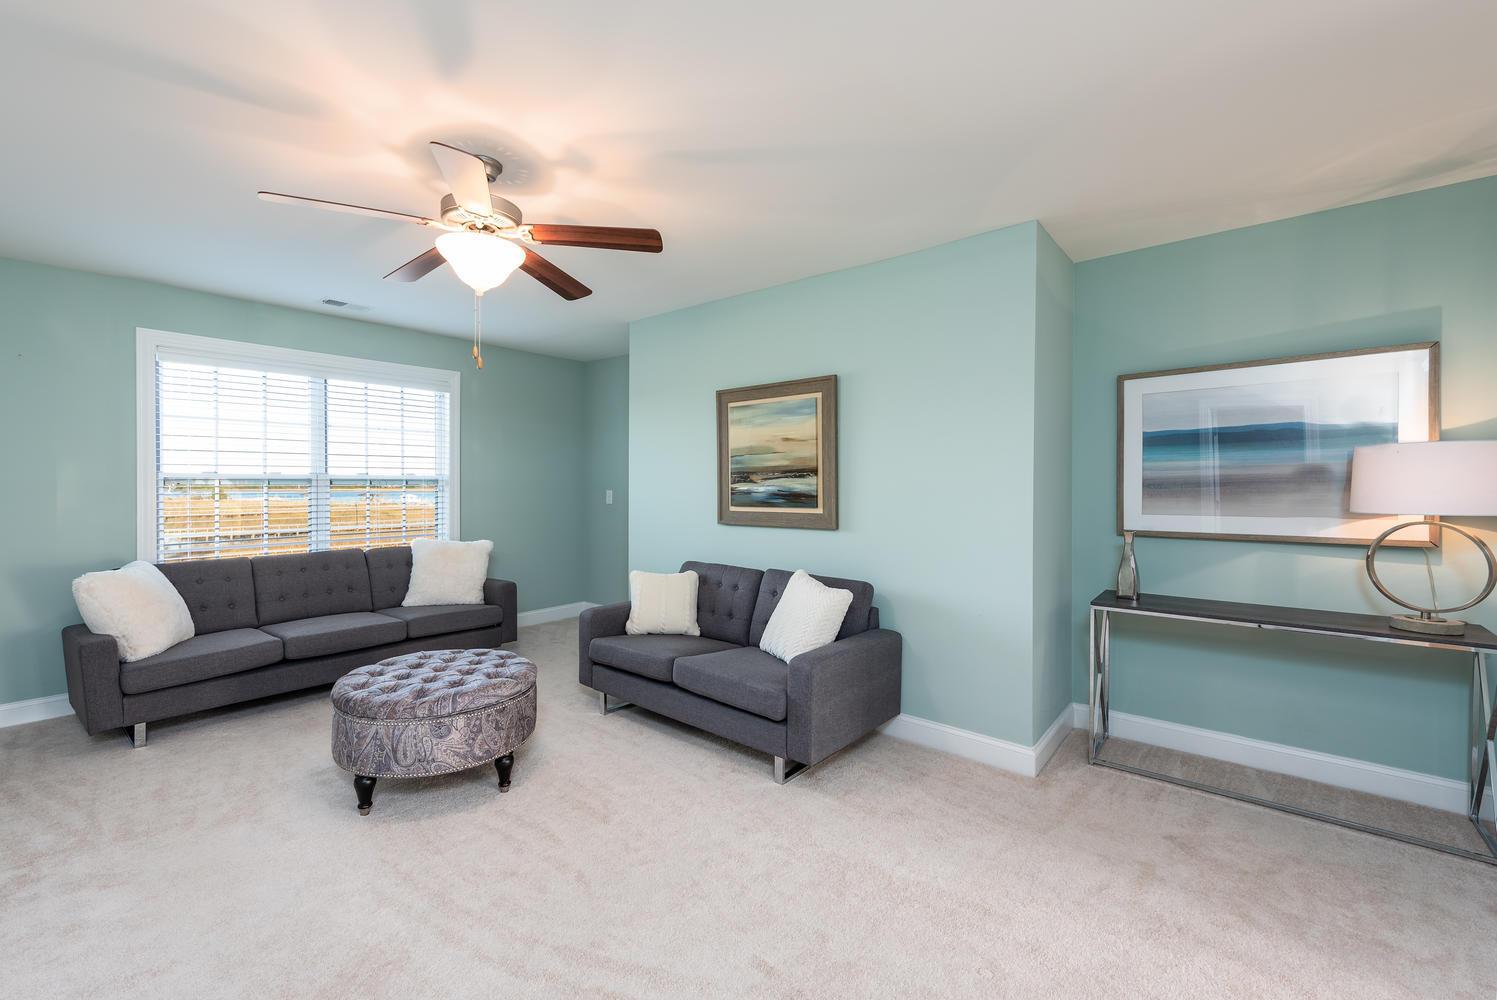 River Reach Pointe Homes For Sale - 1216 Rivers Reach Drive, Charleston, SC - 30